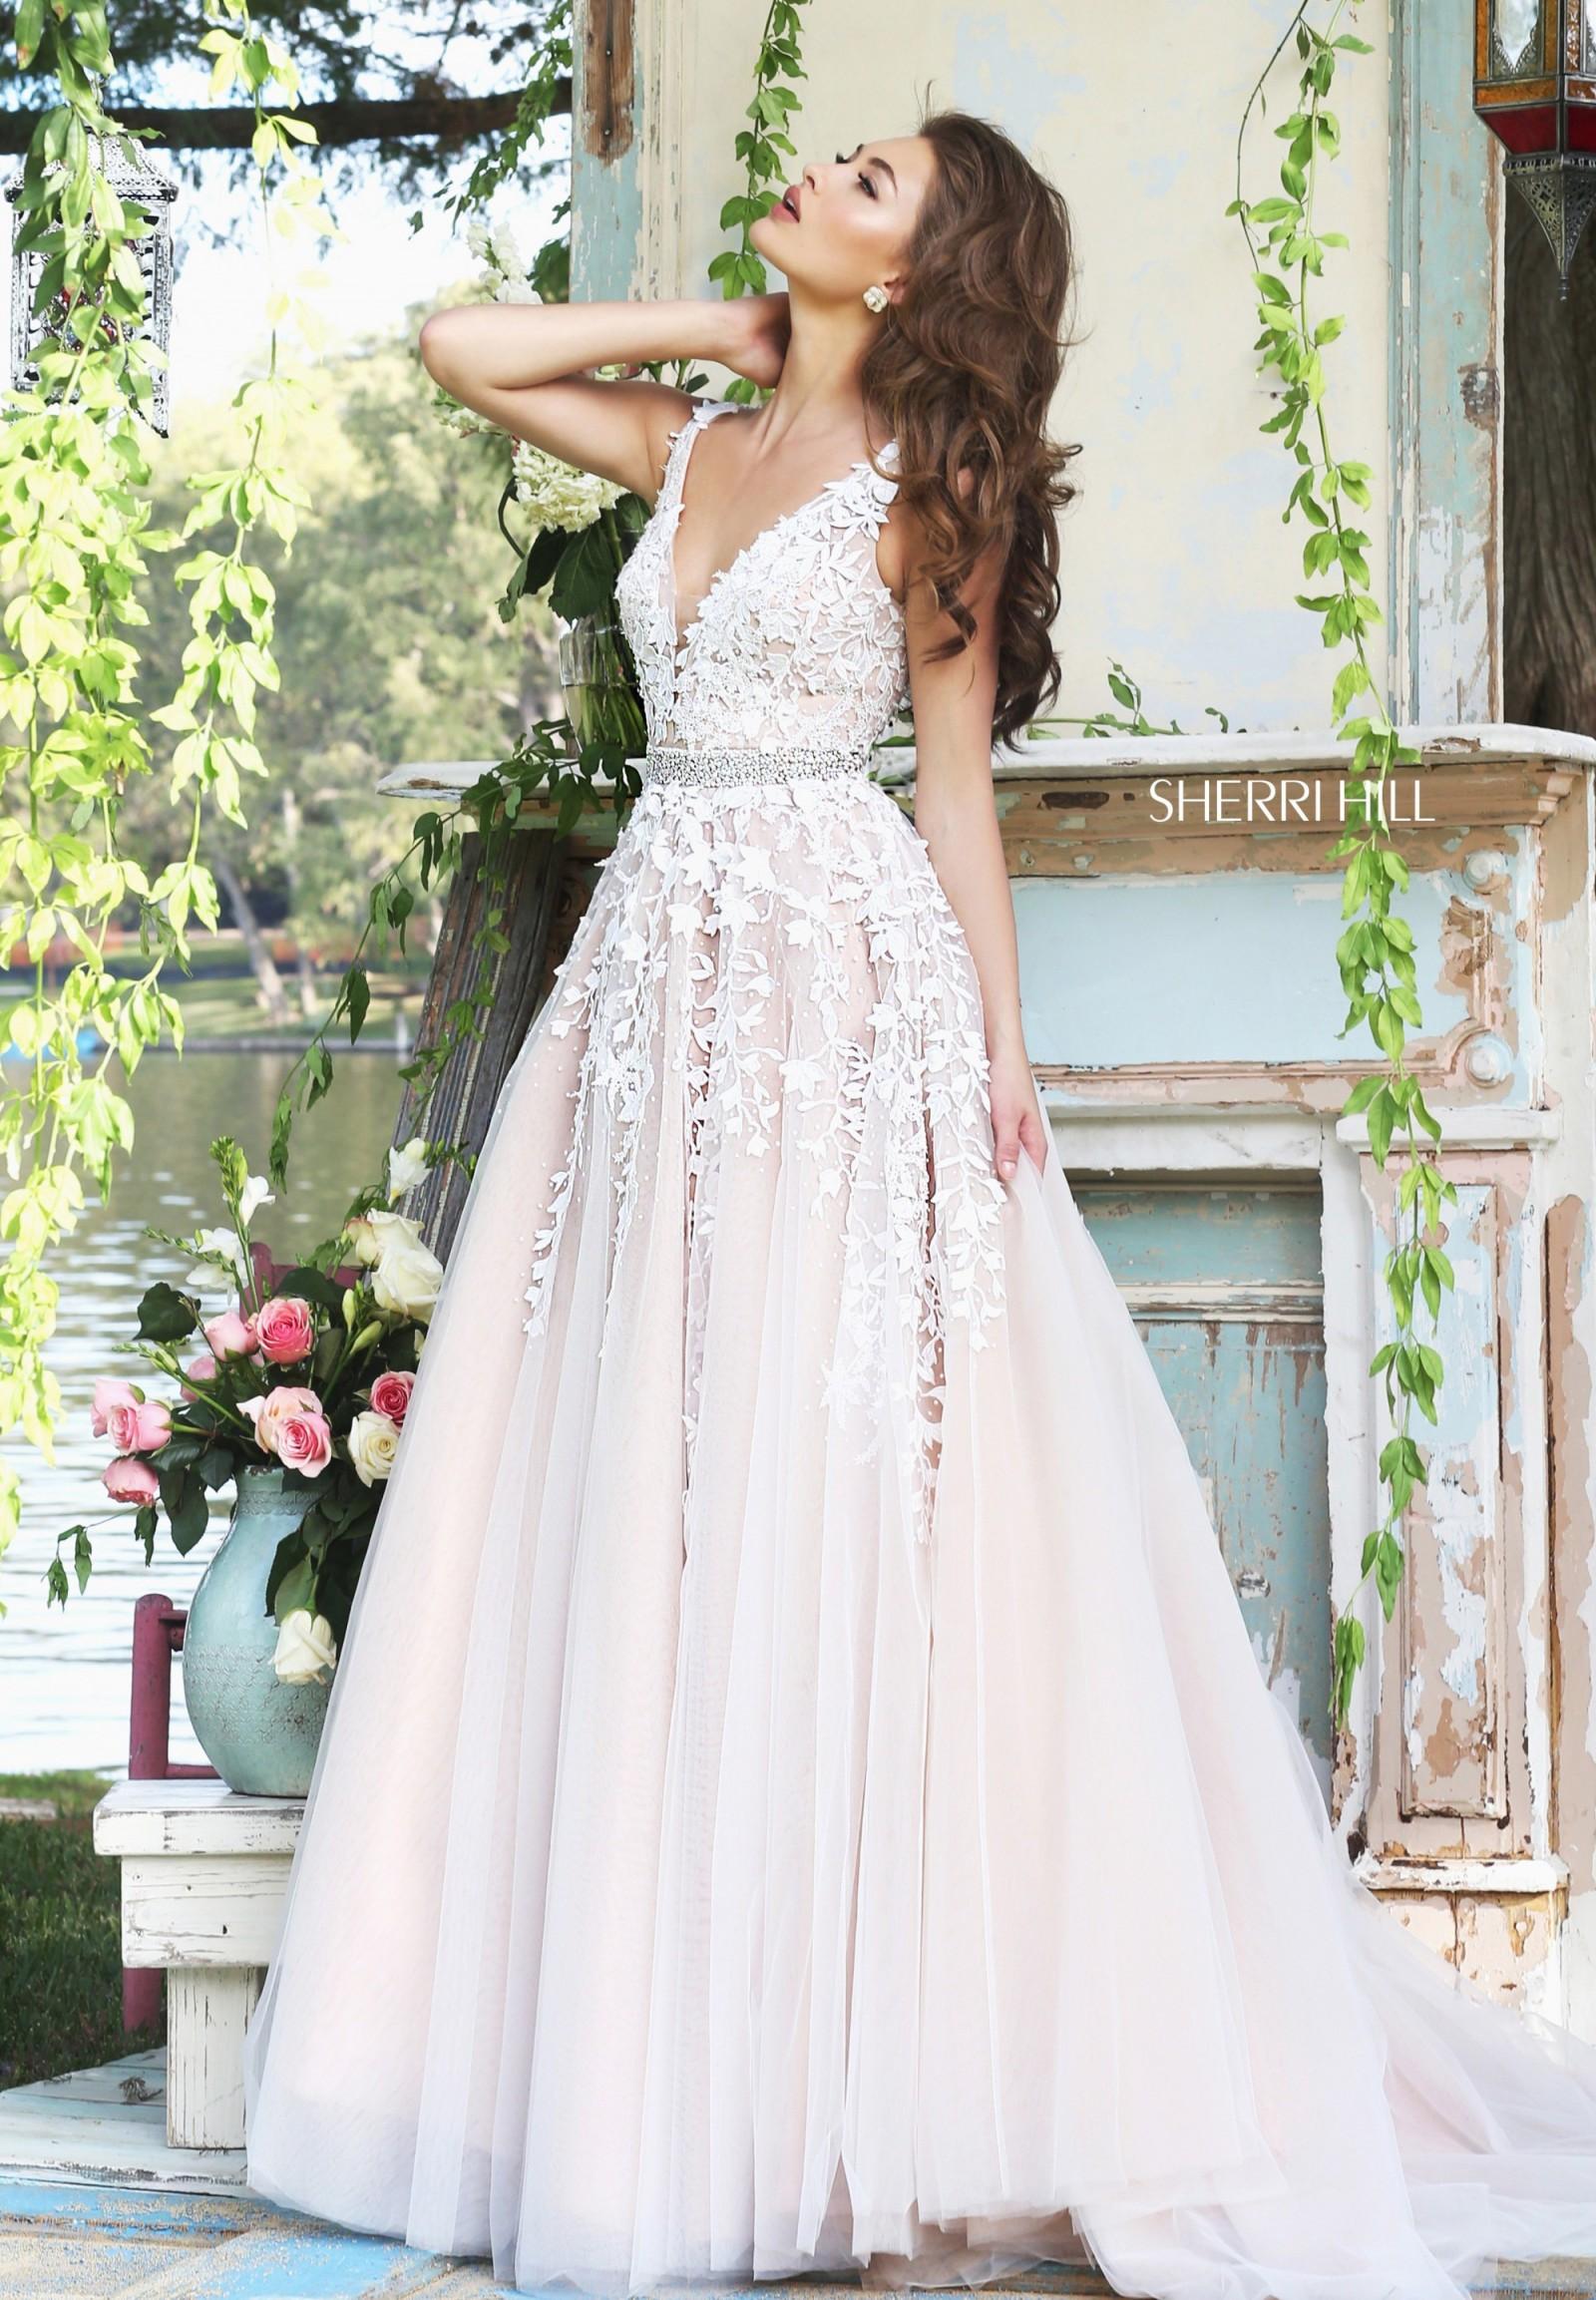 sherri hill wedding dress on sale 44 off